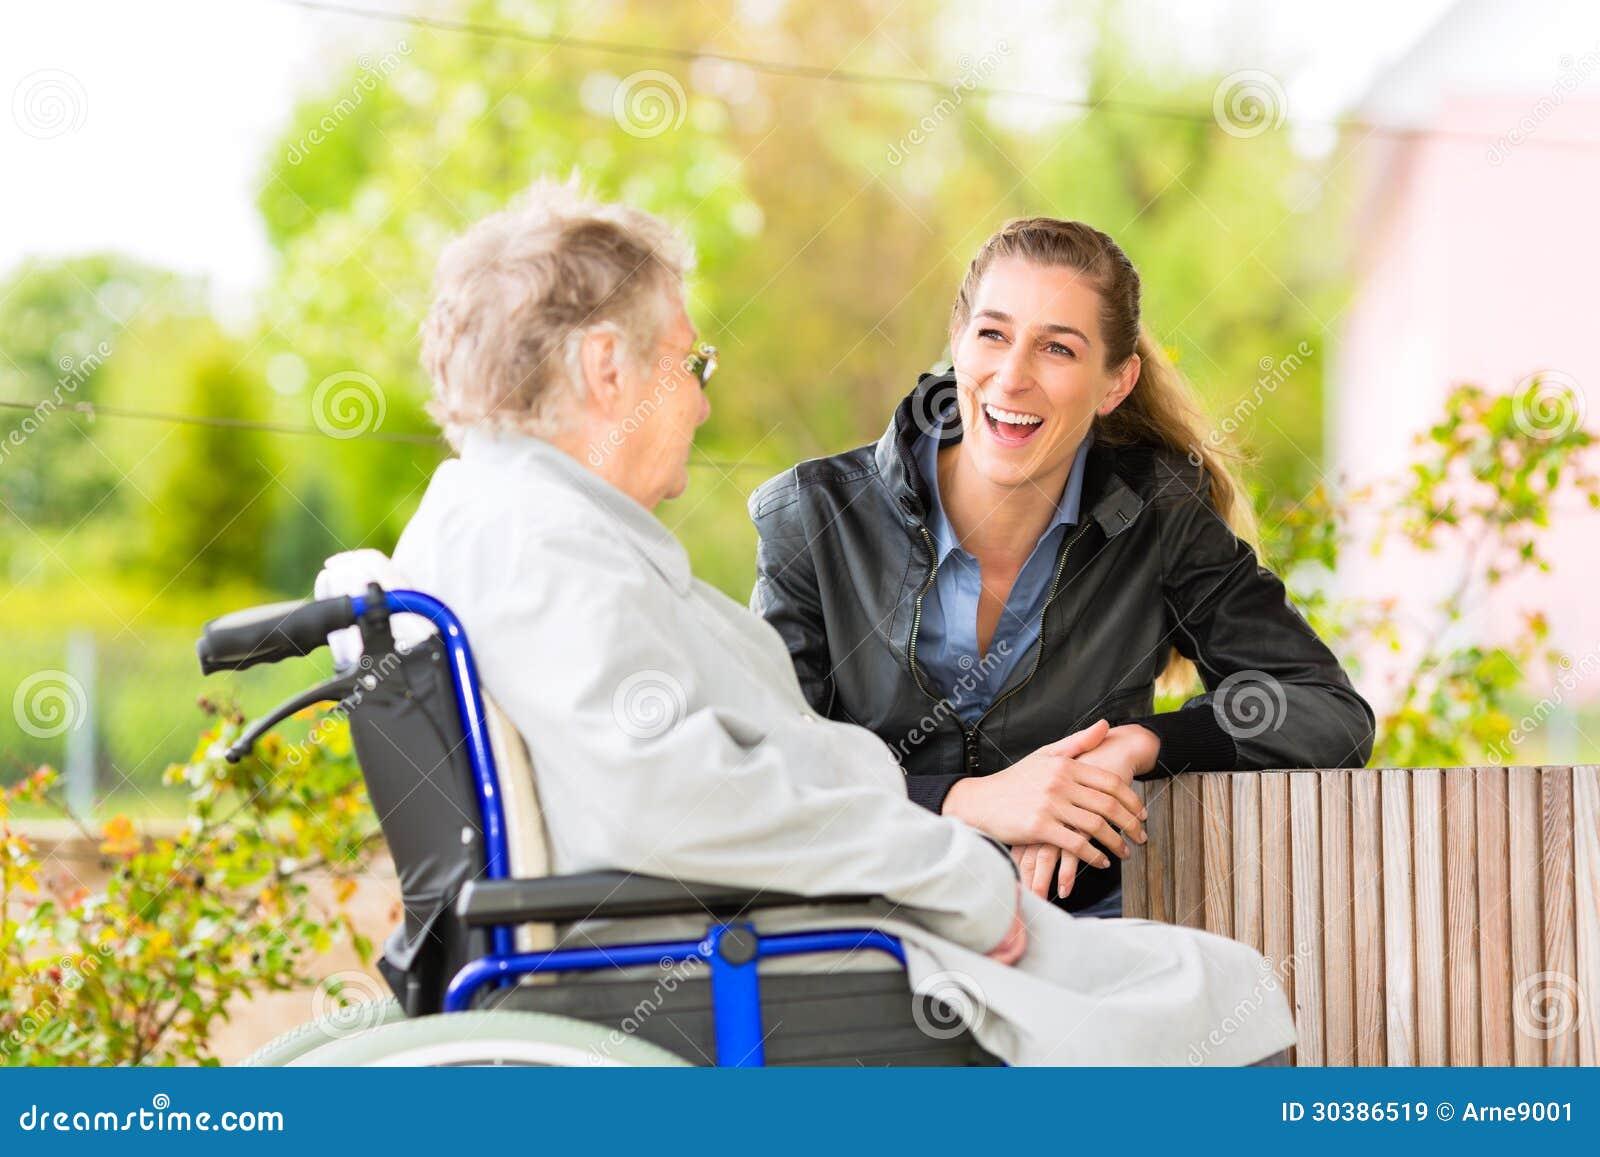 nursing home visit essay